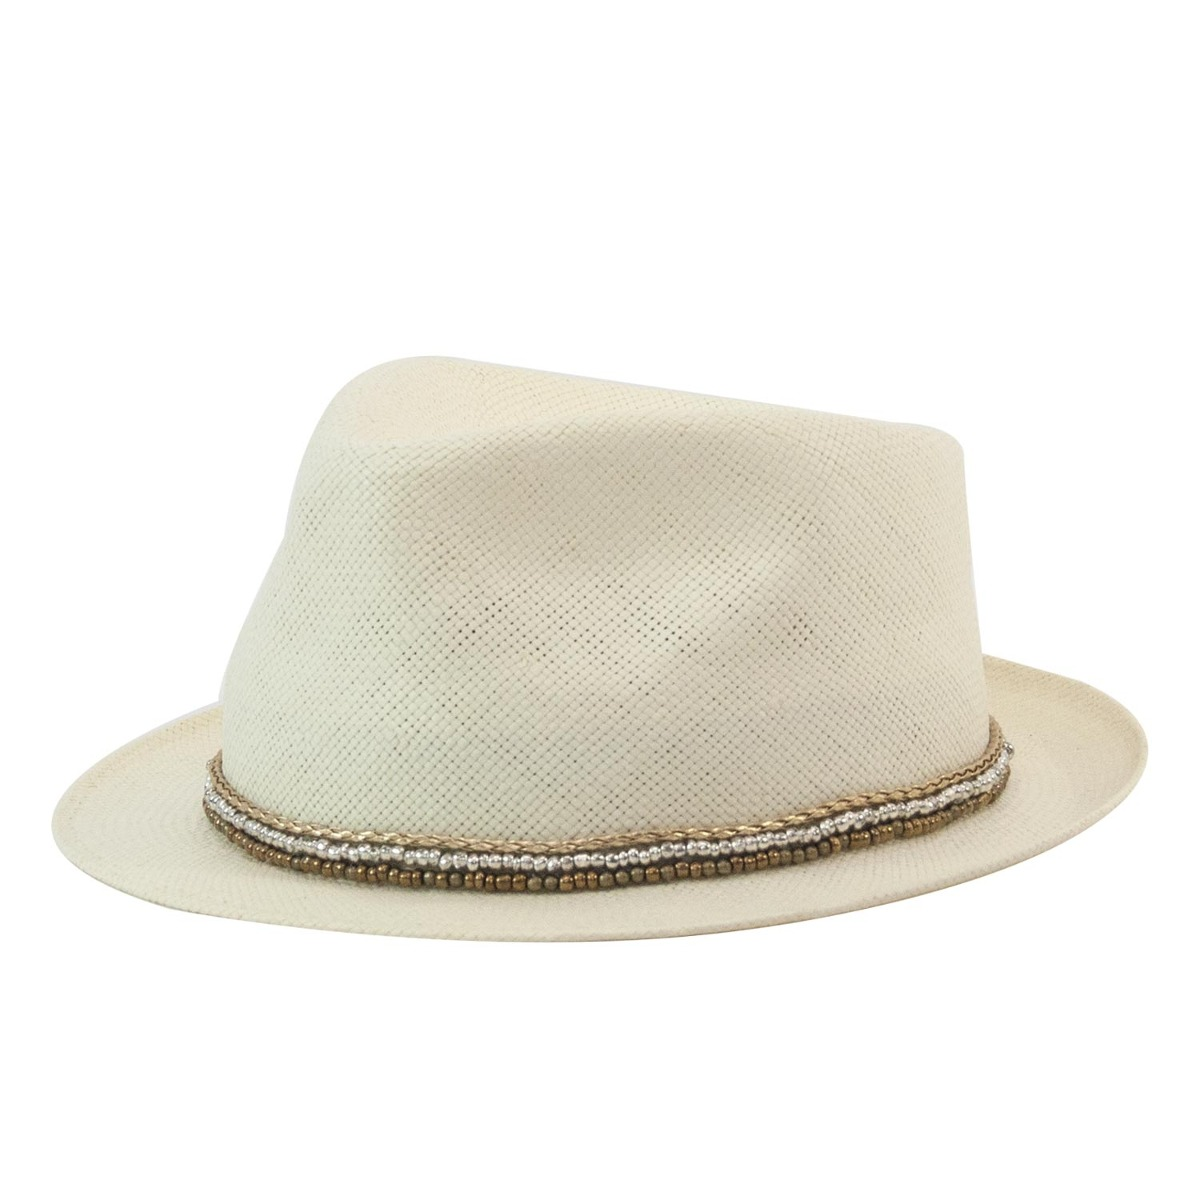 879c128f091b6 chapéu feminino aba curta manly marfim. Carregando zoom.